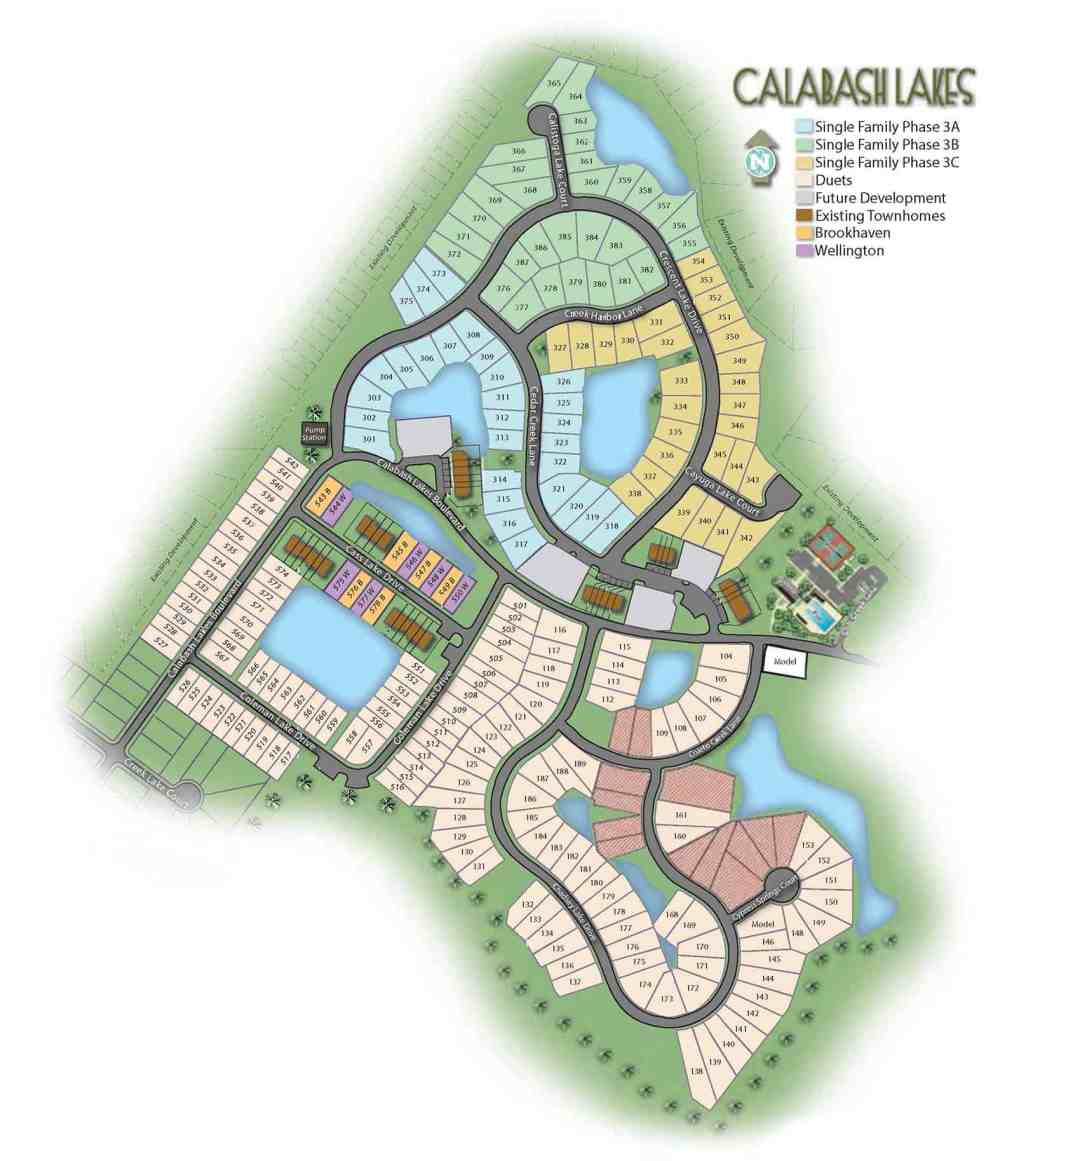 Calabash Lakes Community Map